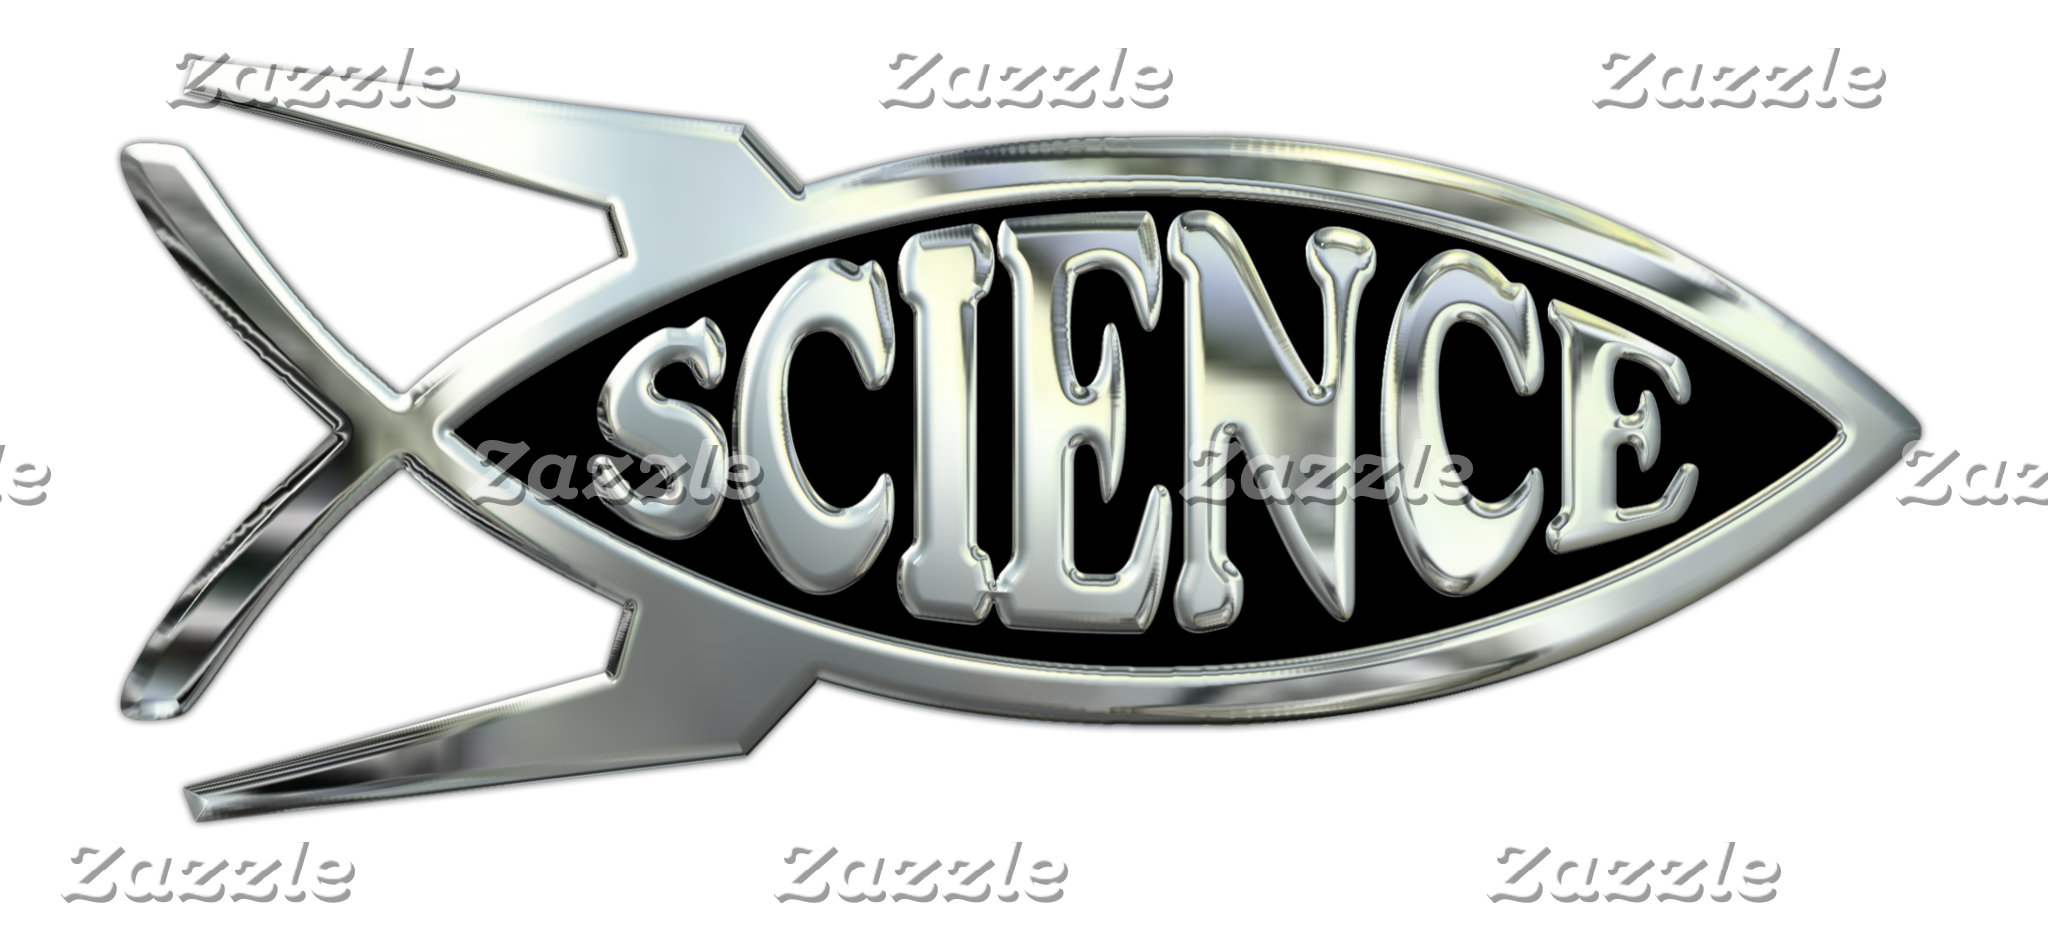 Rocket Science Evolve Fish